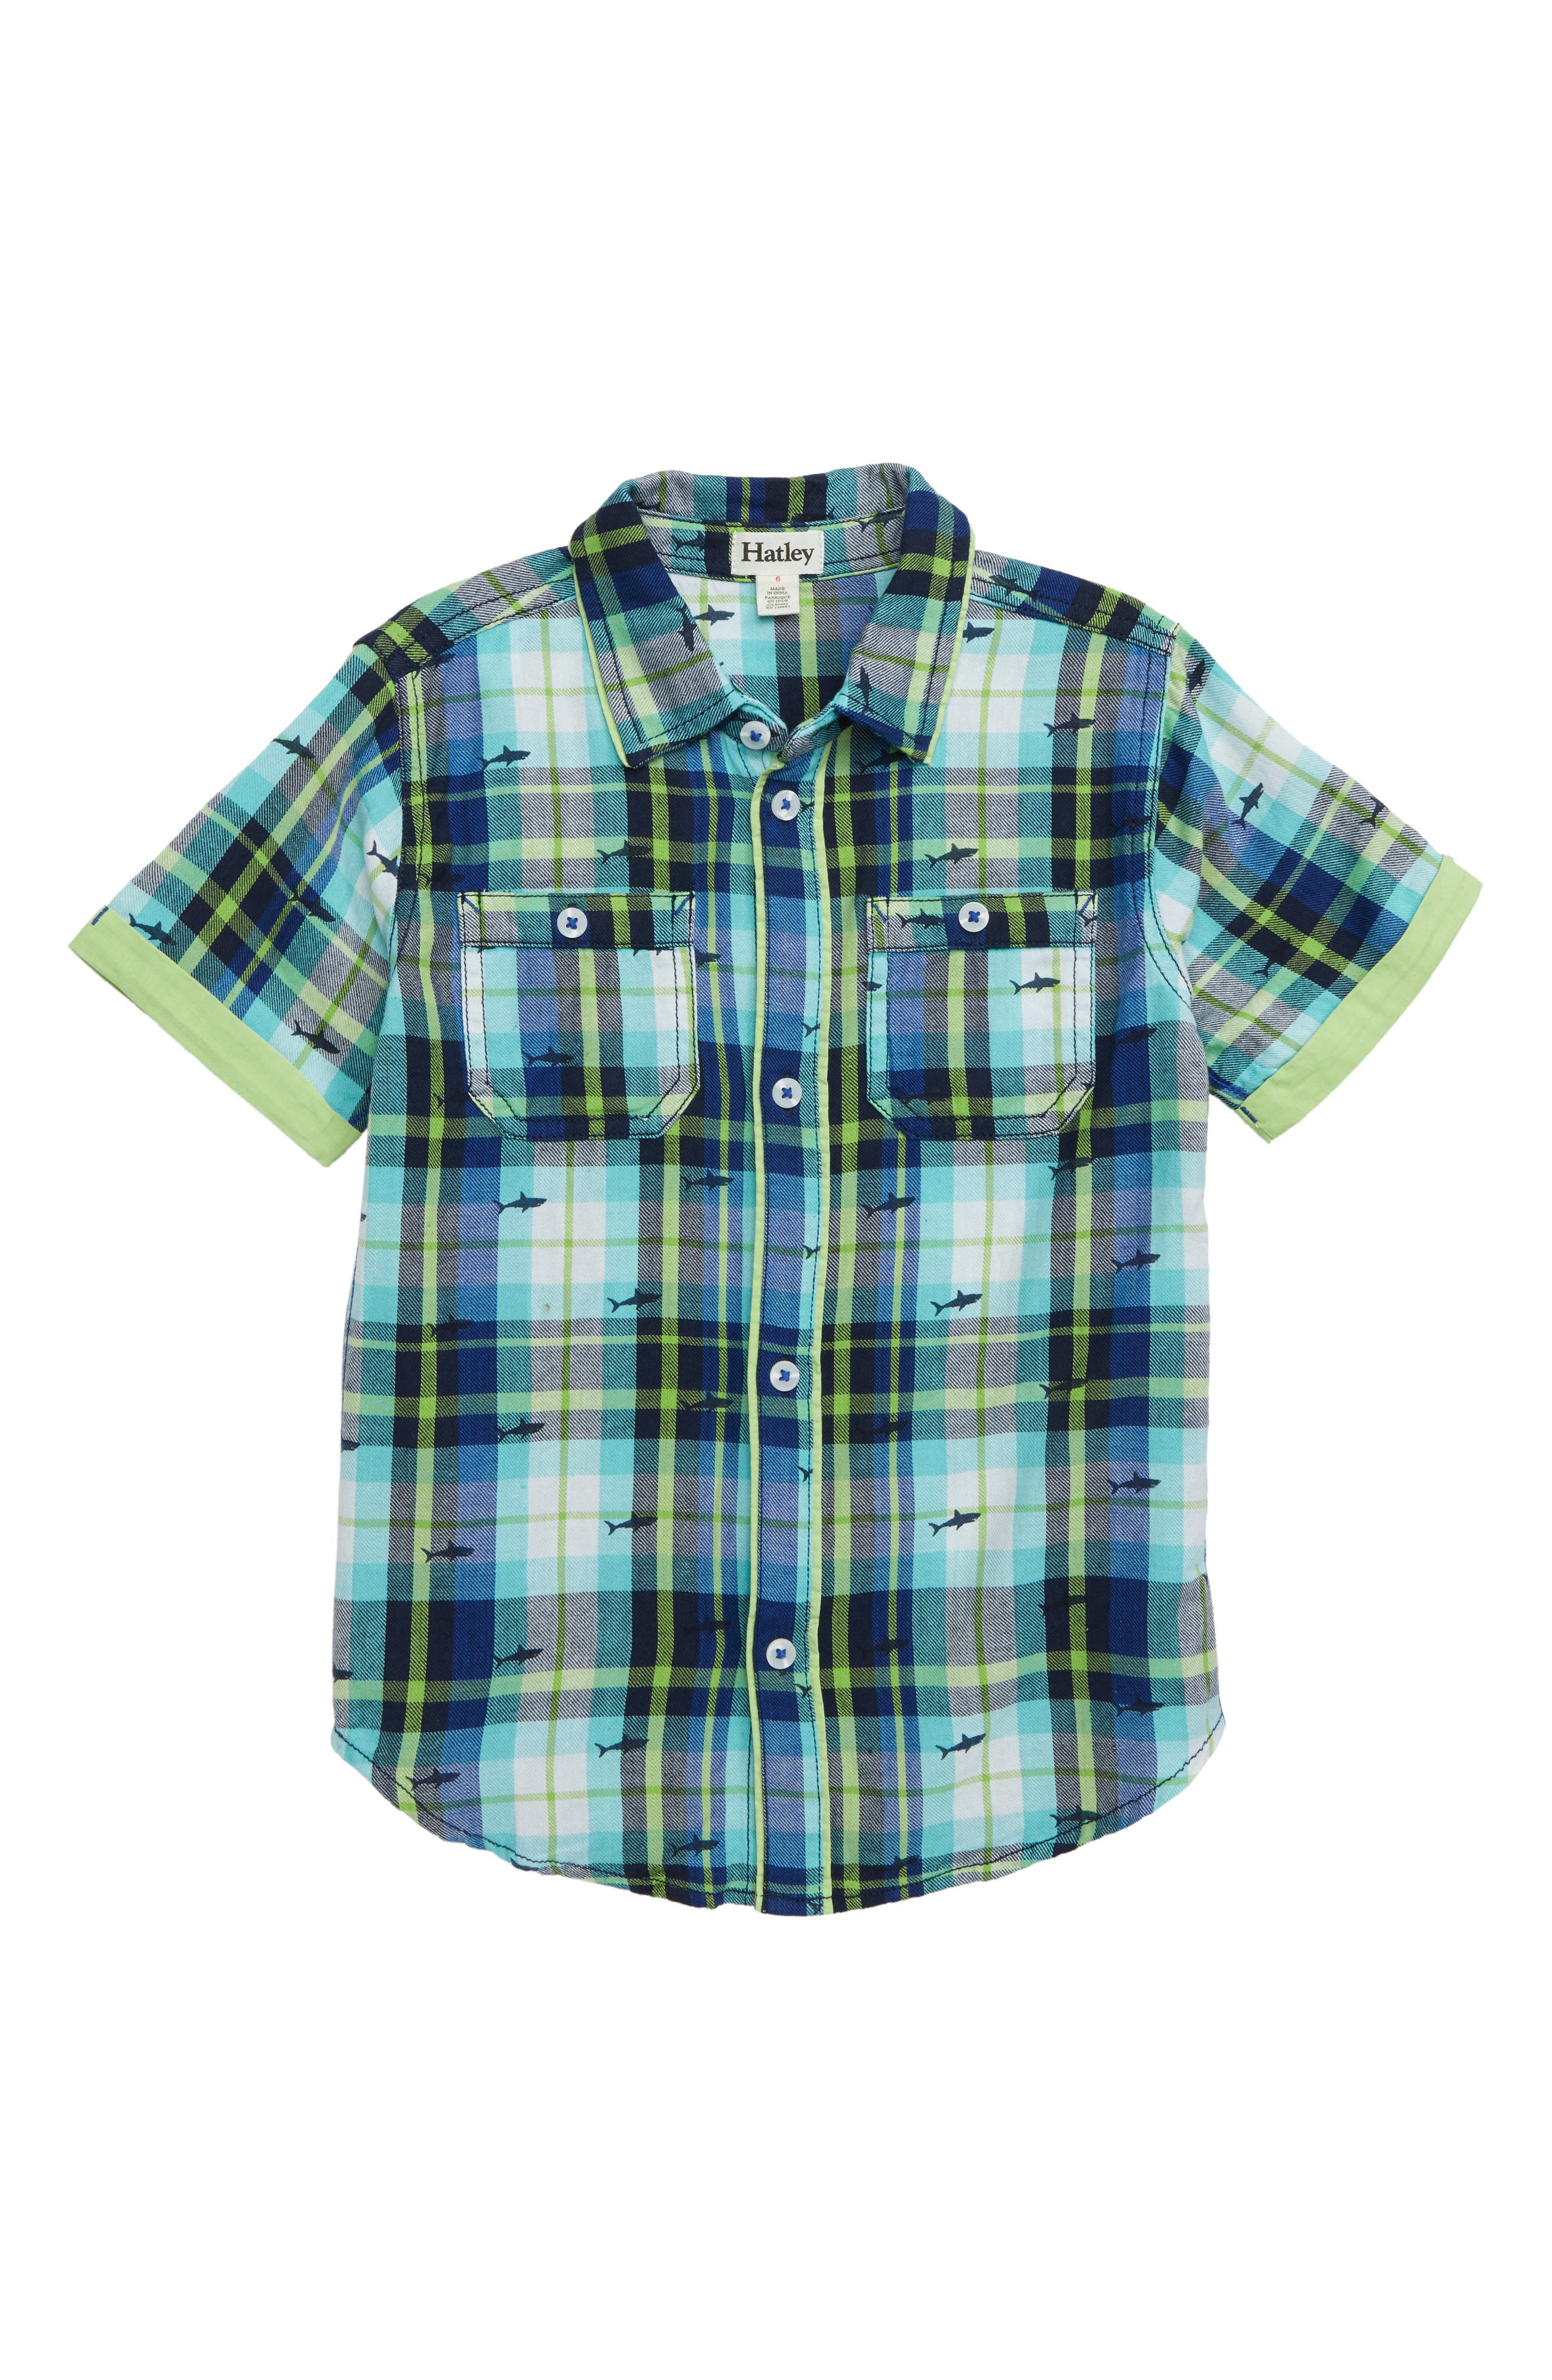 HATLEY, Shark Plaid Flannel Shirt, Main thumbnail 1, color, BLUE